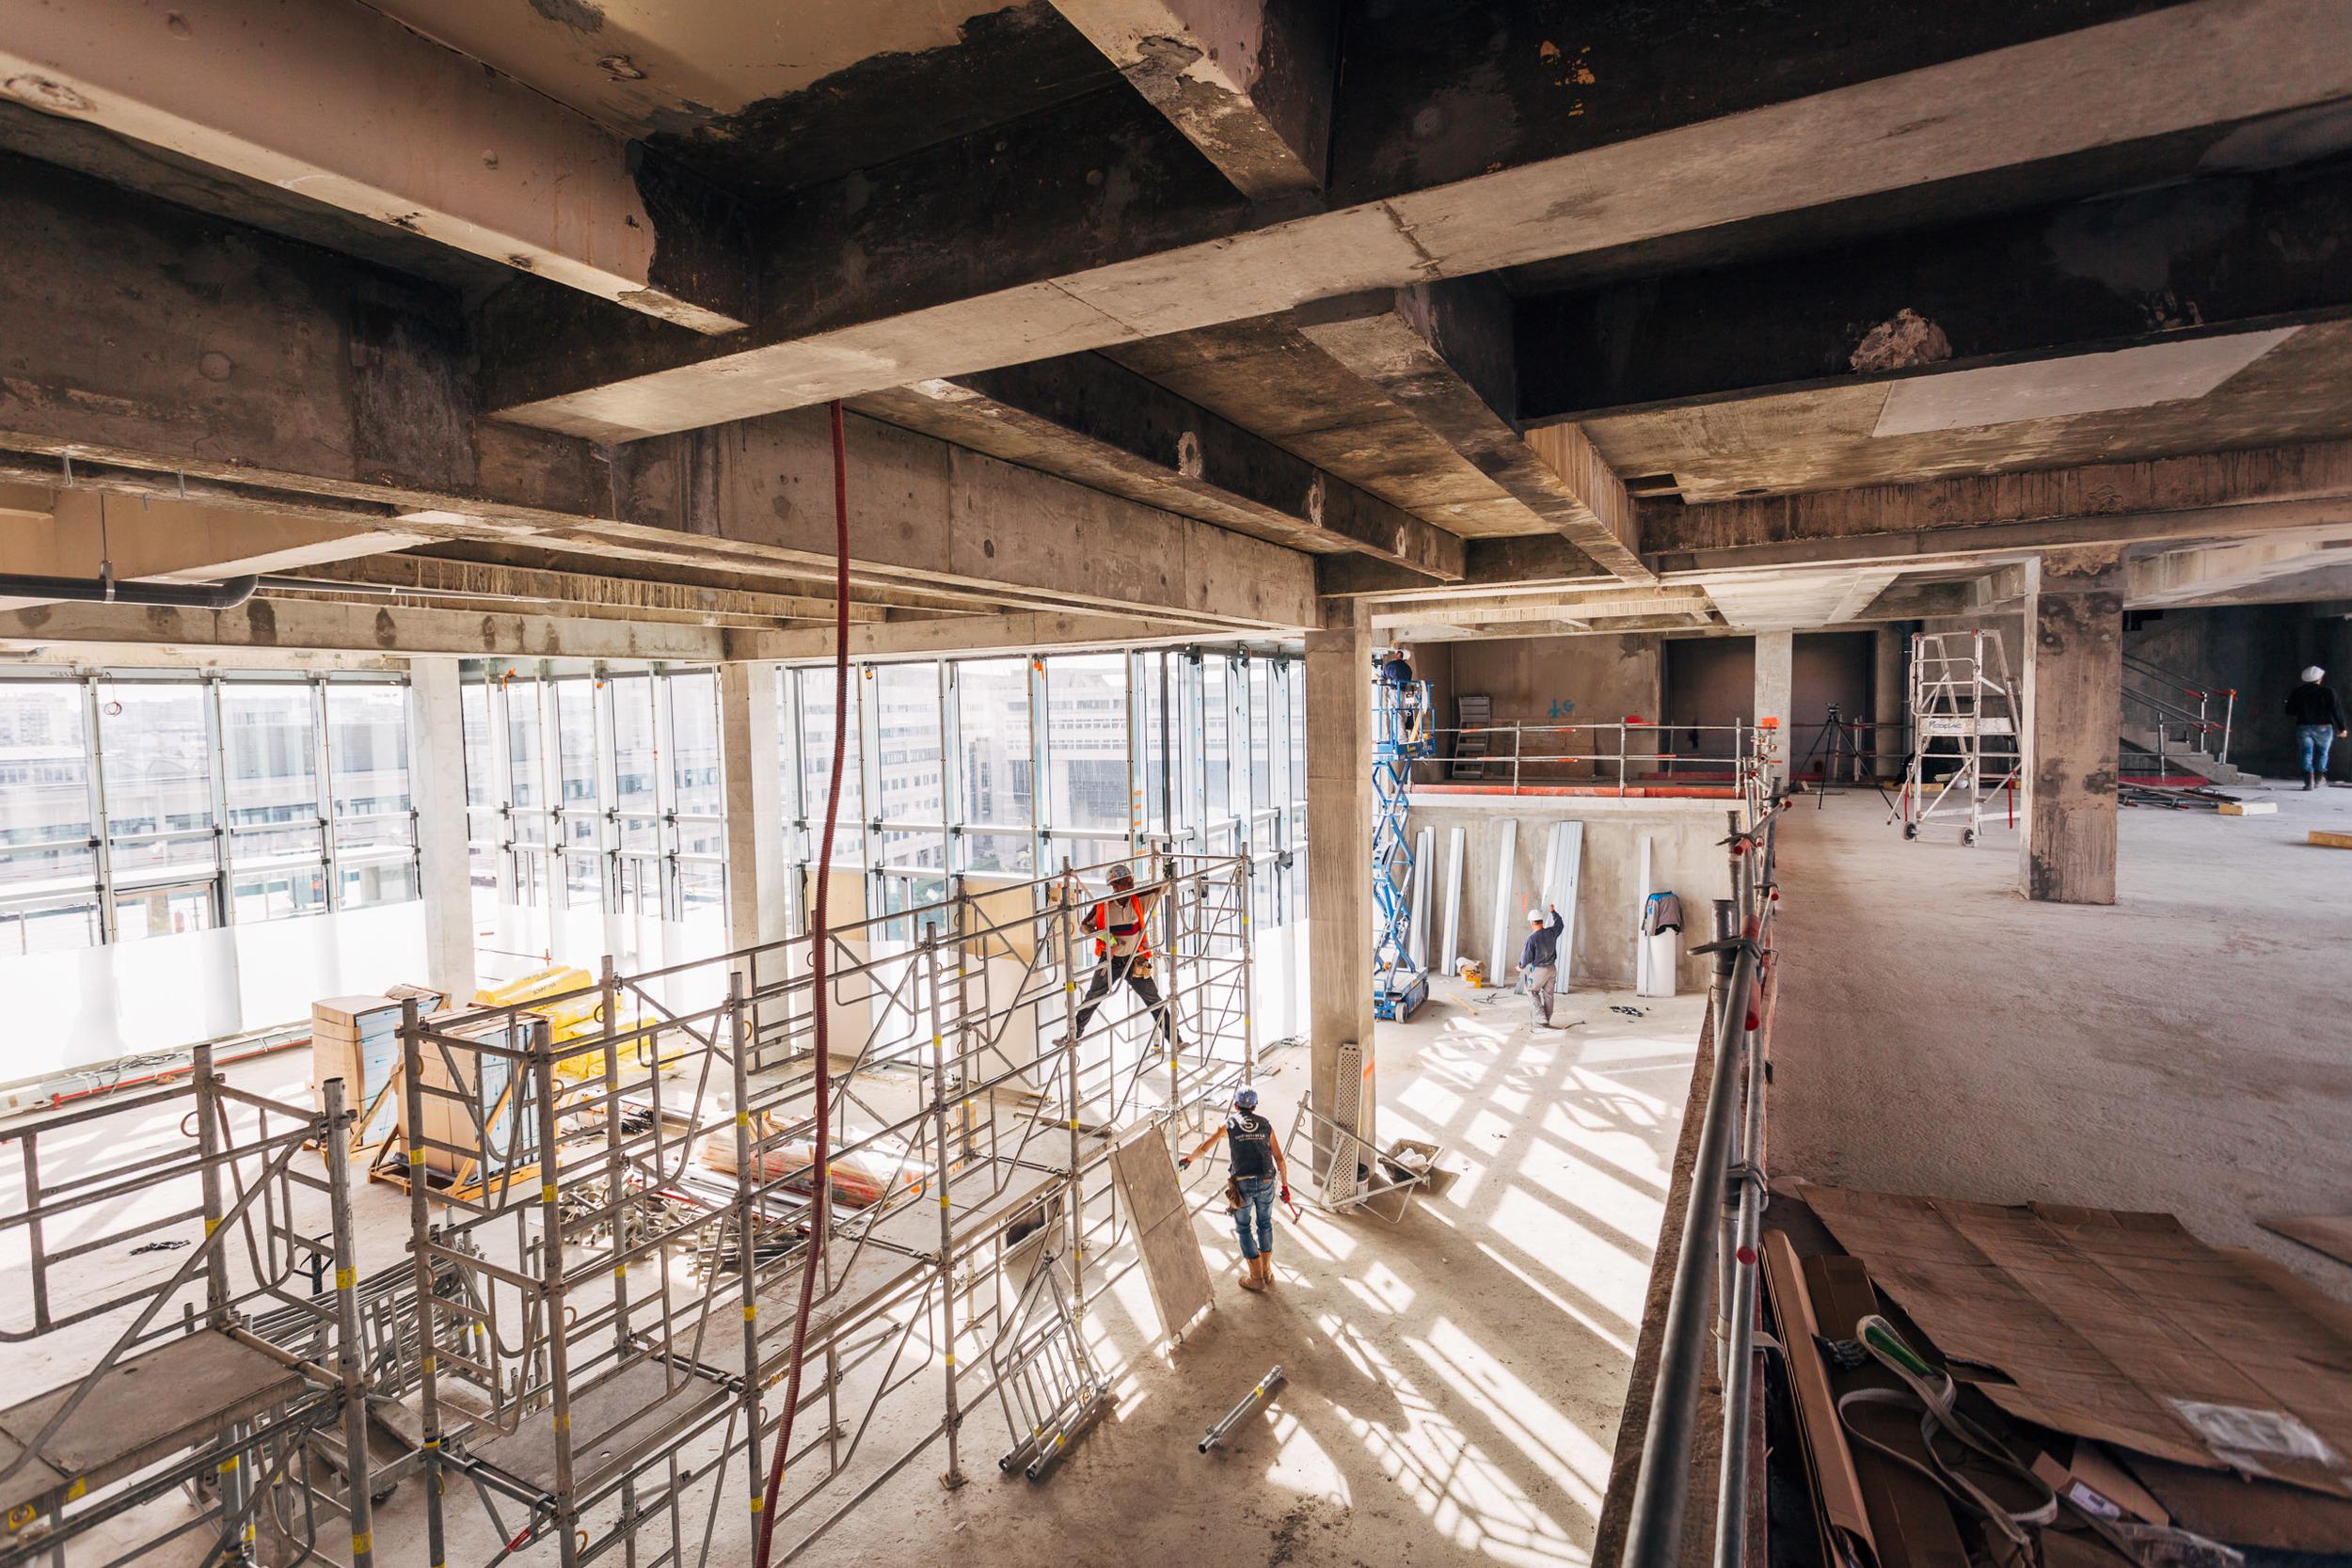 2016-07-06, Eiffage Construction Tertiaire, VIVACITY, Chantier N°704 800-71.jpg